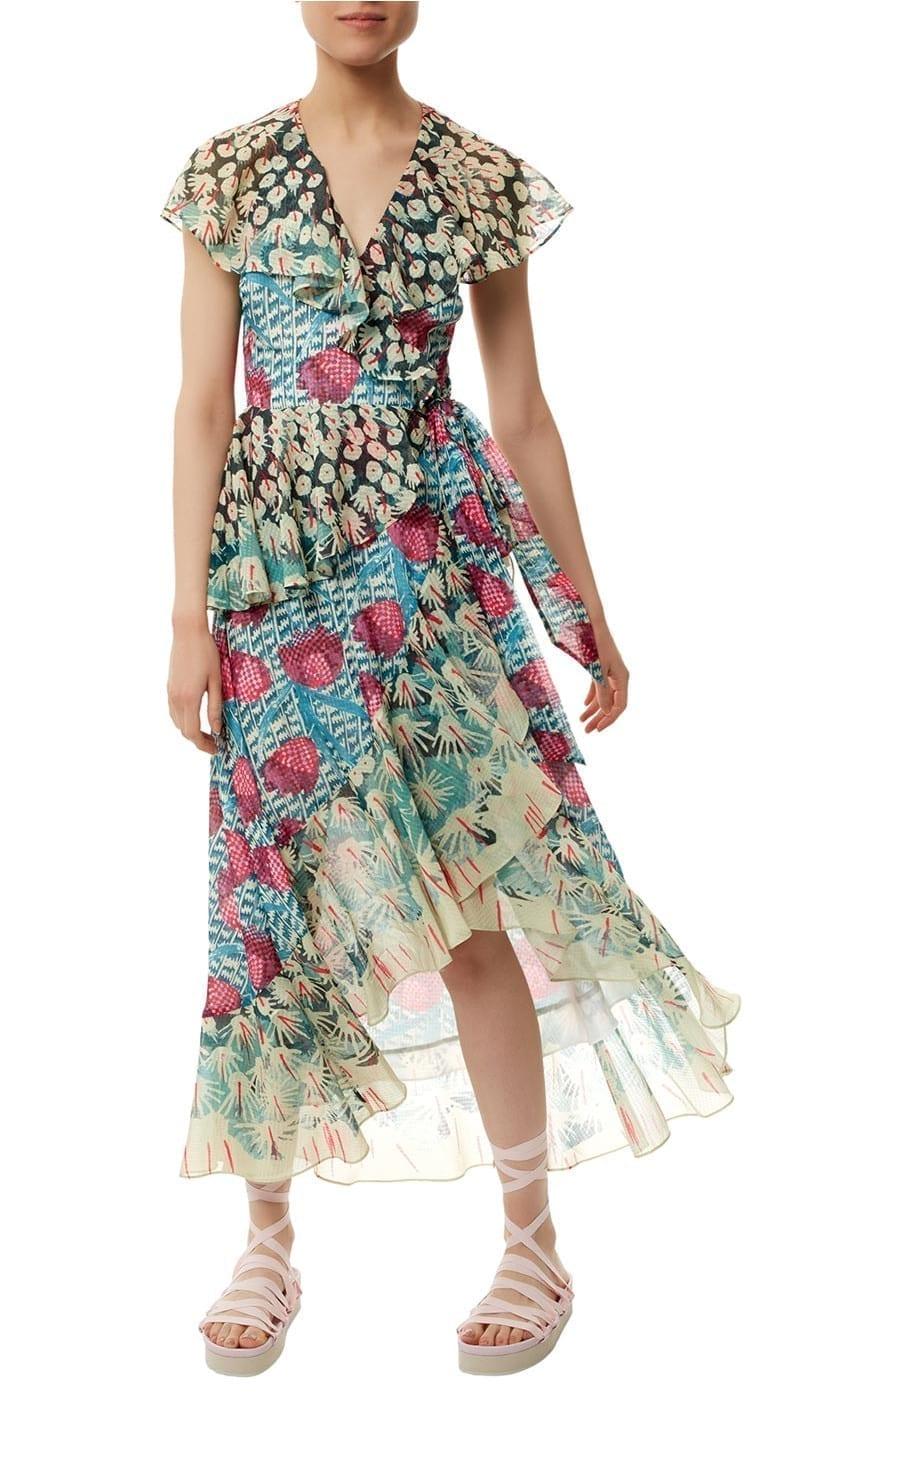 TEMPERLEY LONDON Garden Cacti Turquoise / Printed Dress